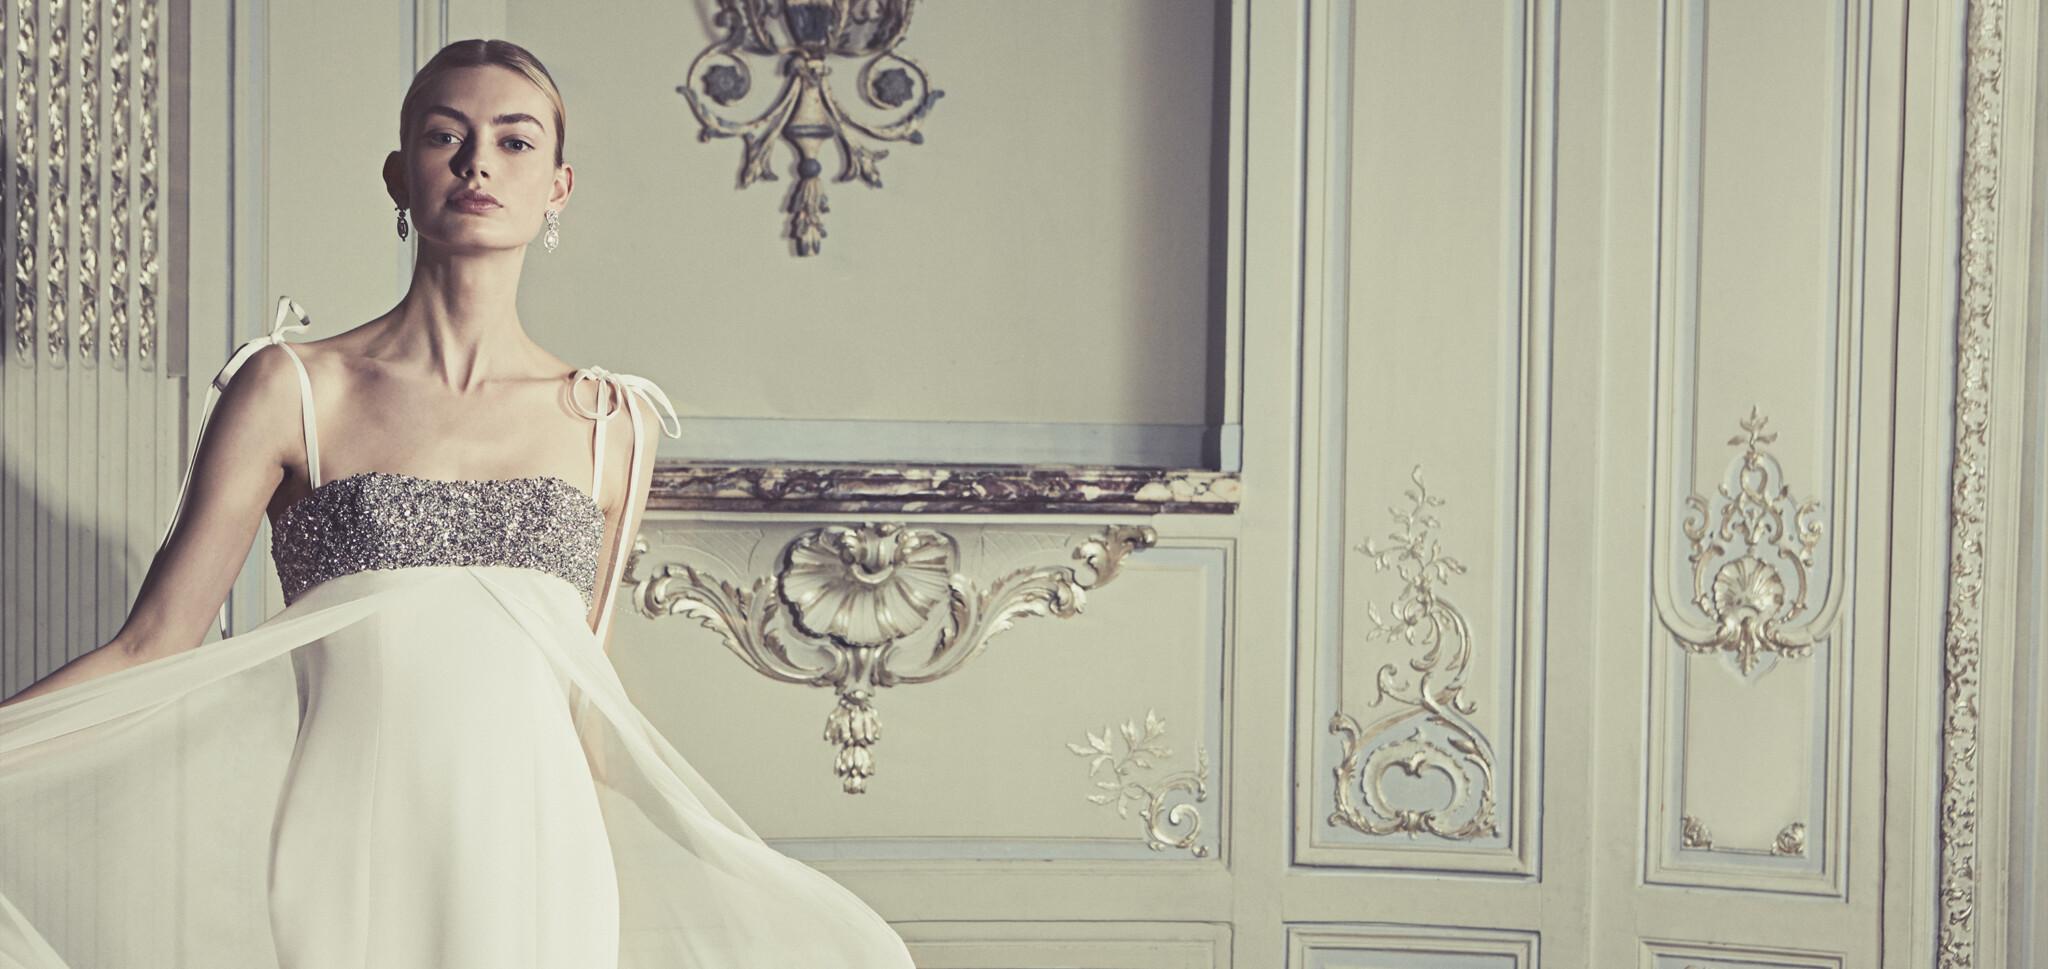 Phillipa-Lepley-Couture-Wedding-Dress-London-UK-Designer-Bespoke-Couture-Claudette-Rocks-Chiffon-Split-Soft-Skirt-Empire-Line-Wedding-Gown B